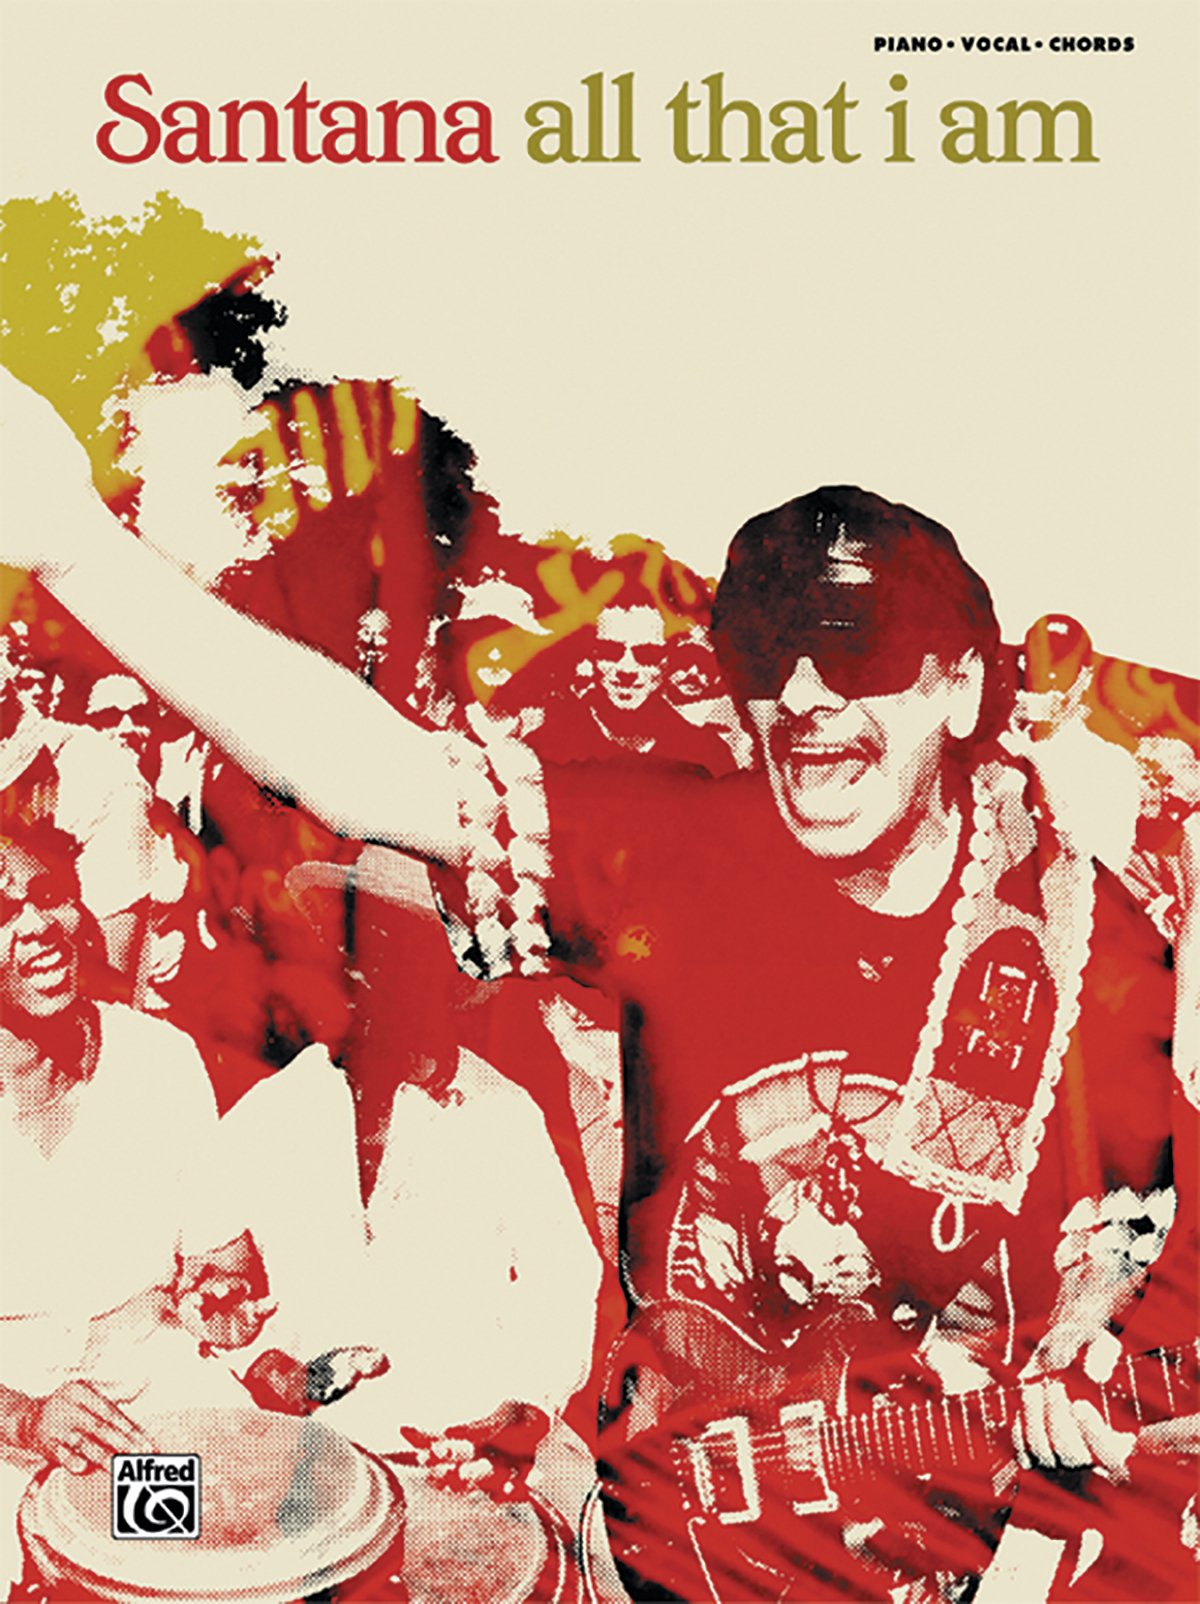 CD Artist S Ultimate Minus One Volume 2 Guitar Tab Sheet Music Carlos Santana